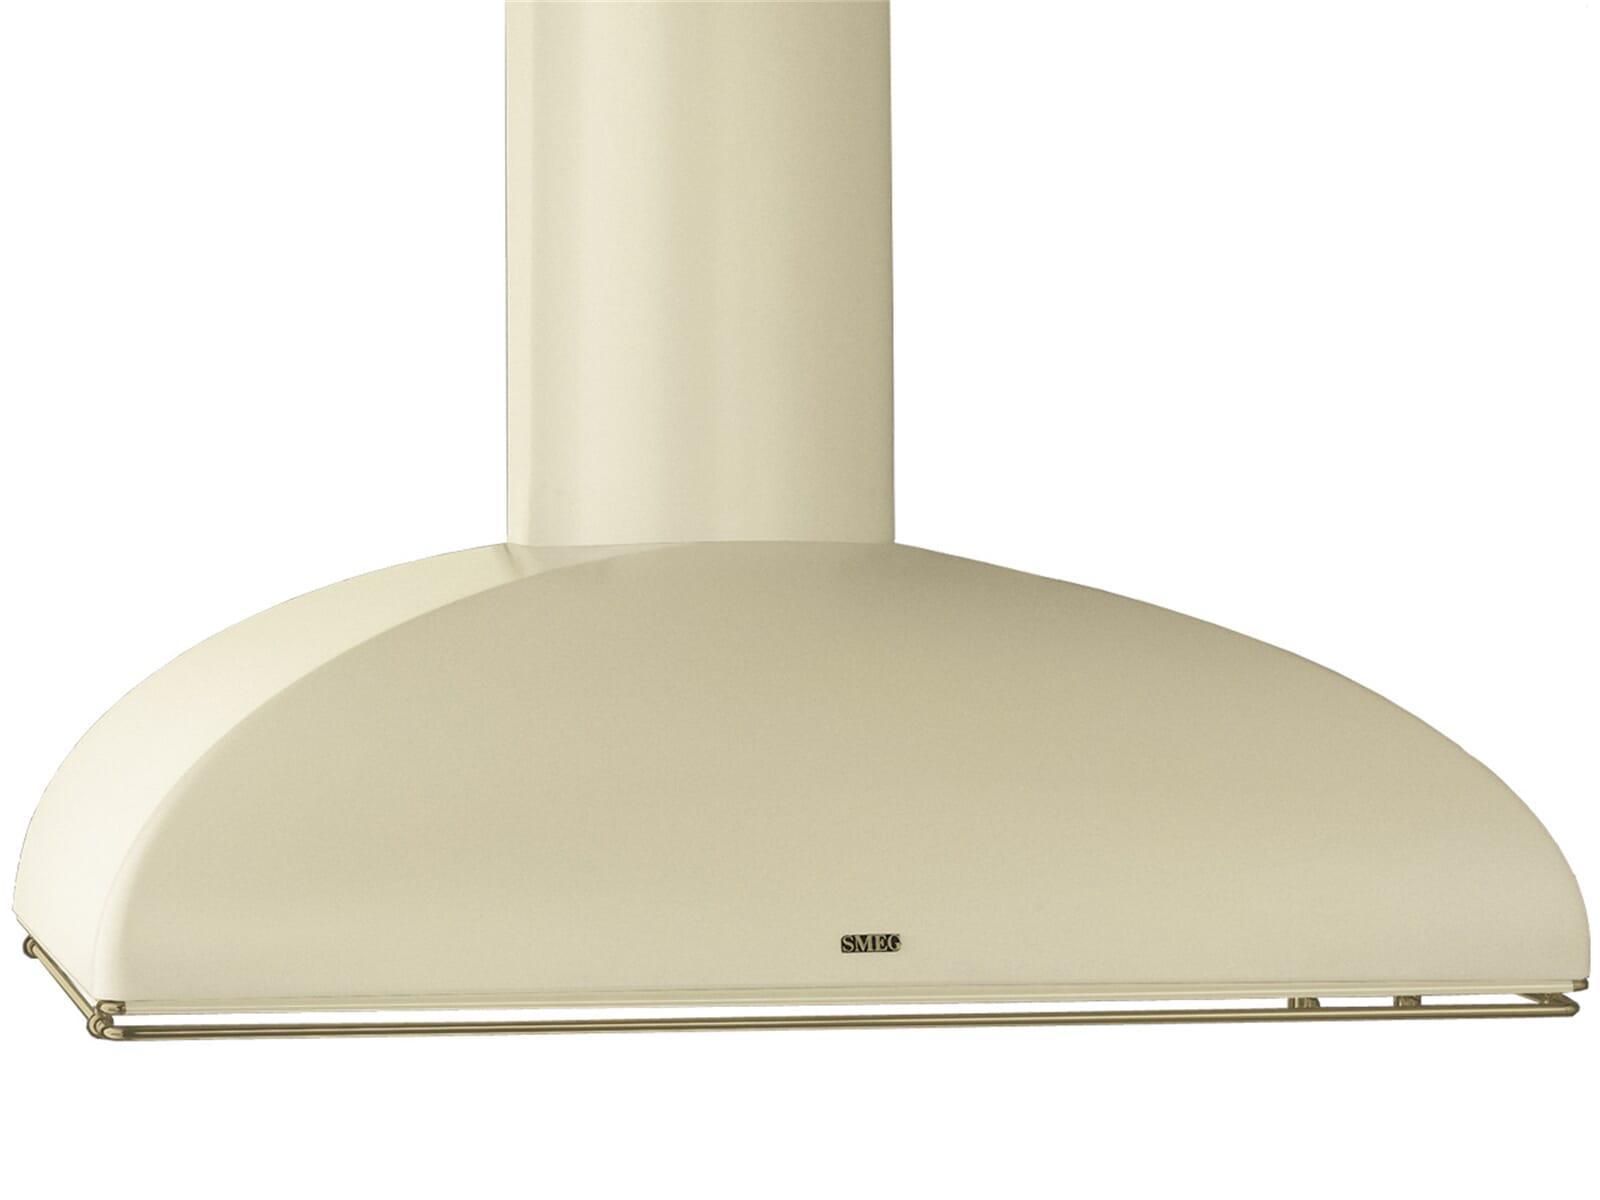 smeg kse89po9 wand dunstabzugshaube creme f r 1169 00 eur. Black Bedroom Furniture Sets. Home Design Ideas